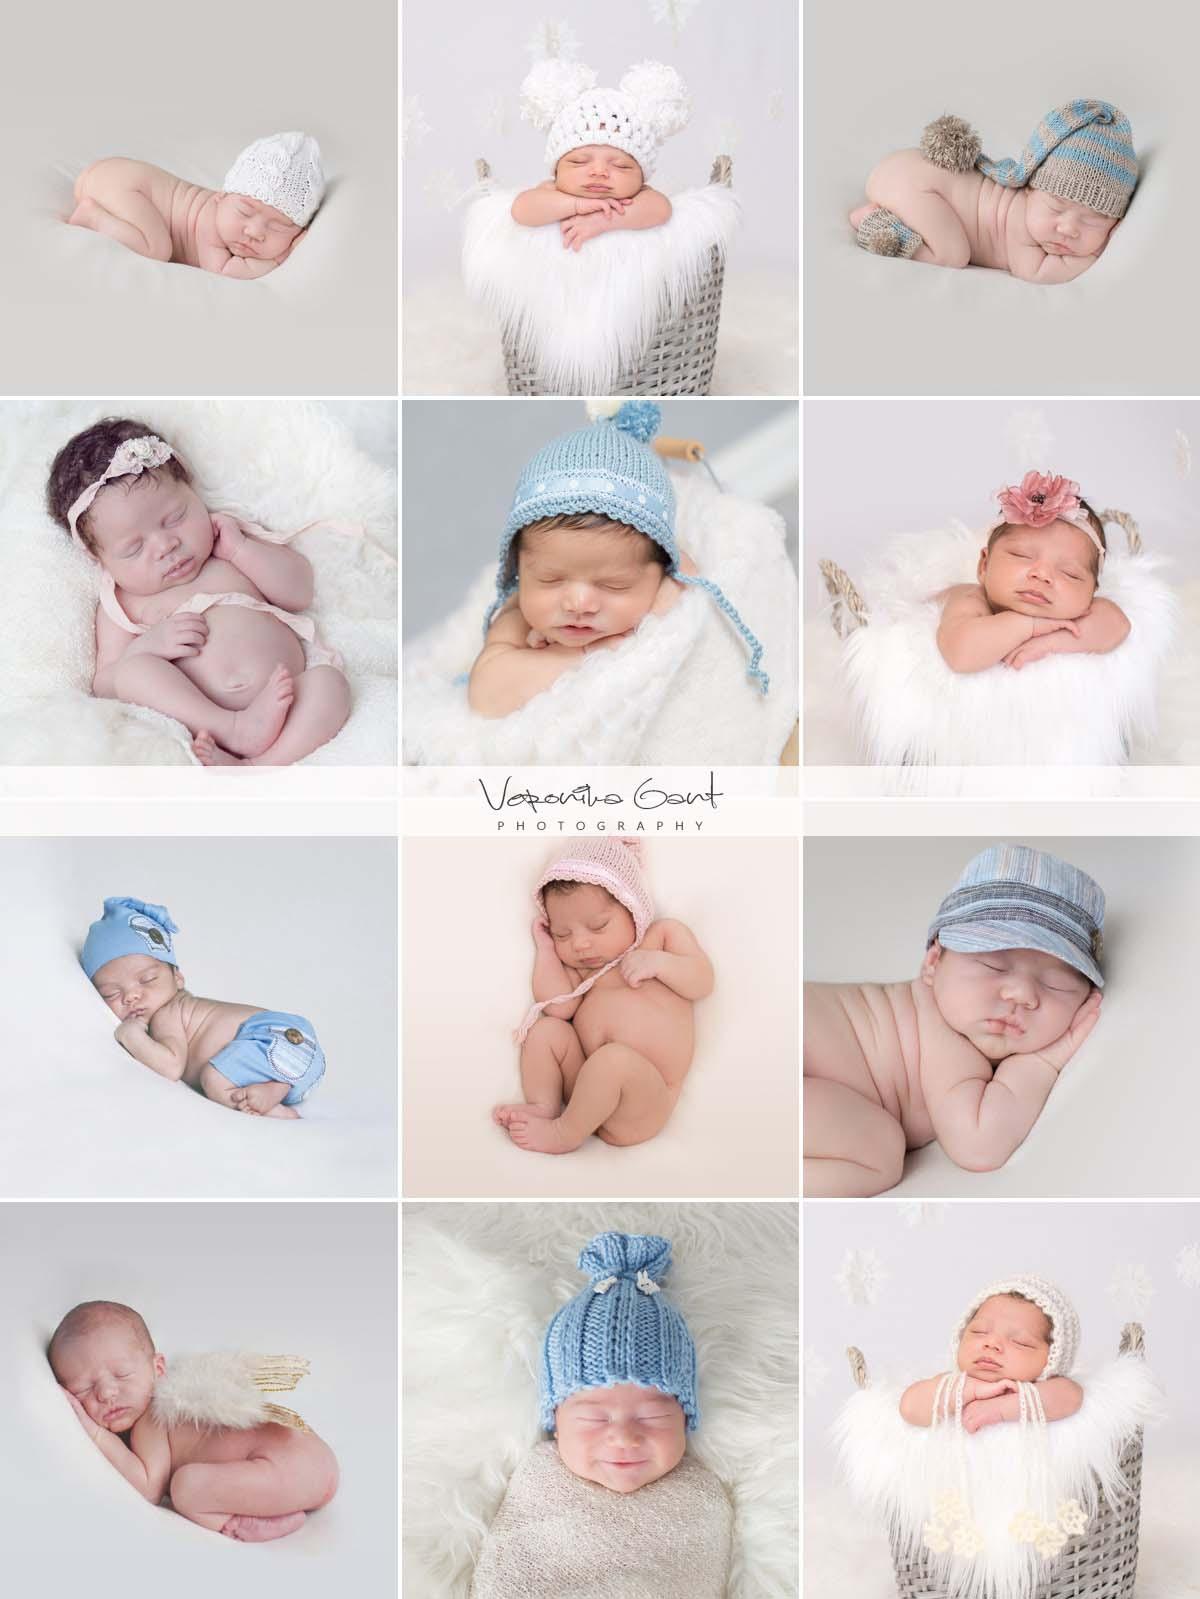 Newborn-Photography-Ideas-babies-mix